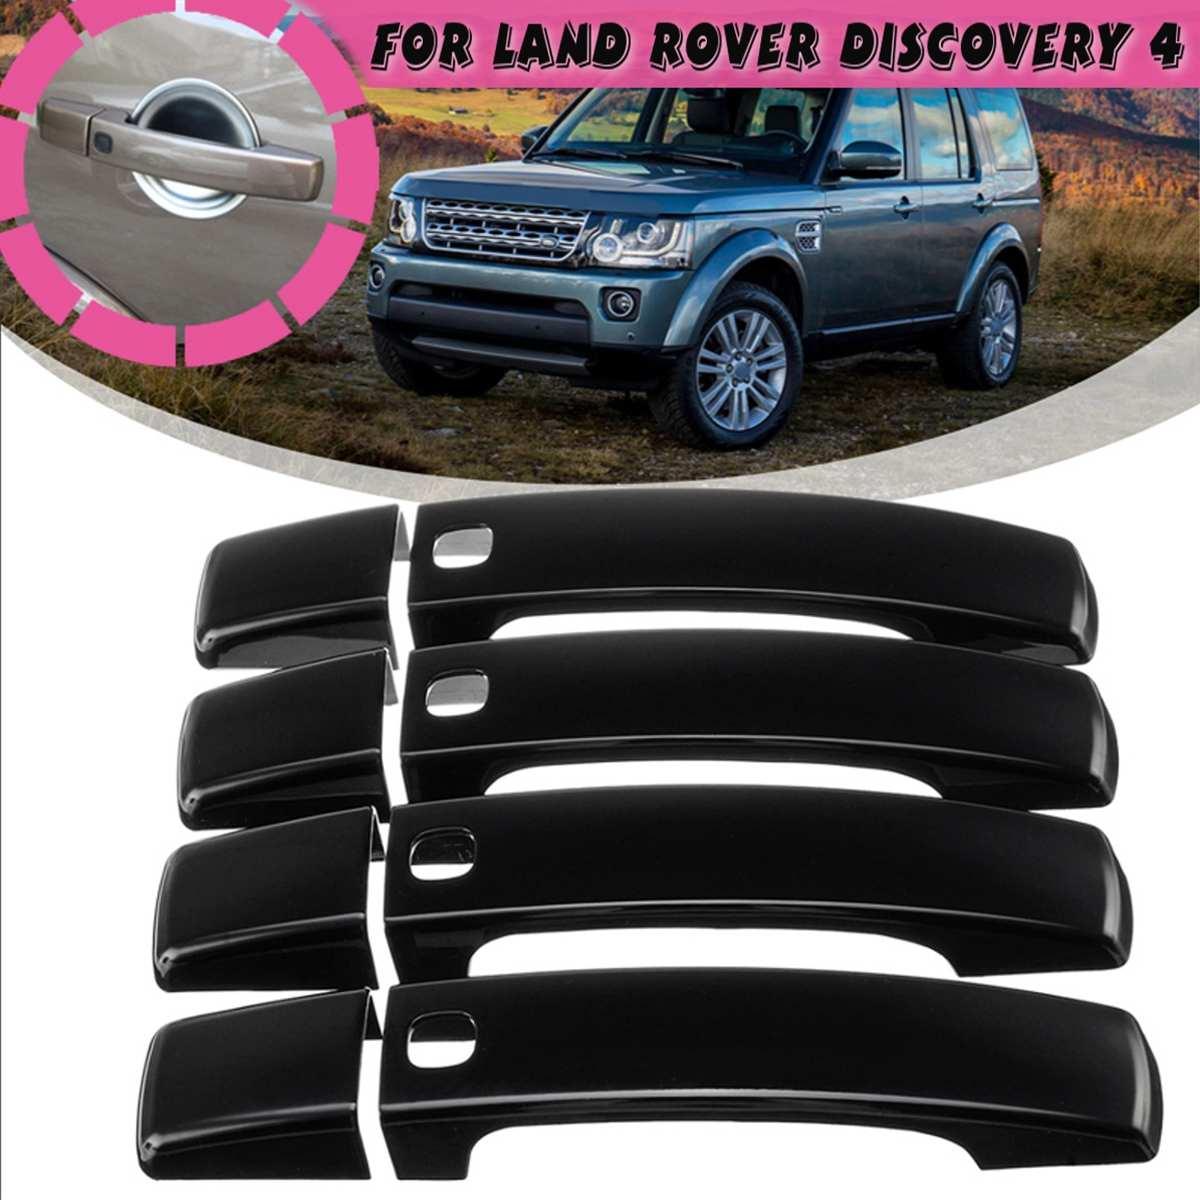 Sizver Chrome Door handle cover For 2006-2010 Land Rover Range Rover Sport